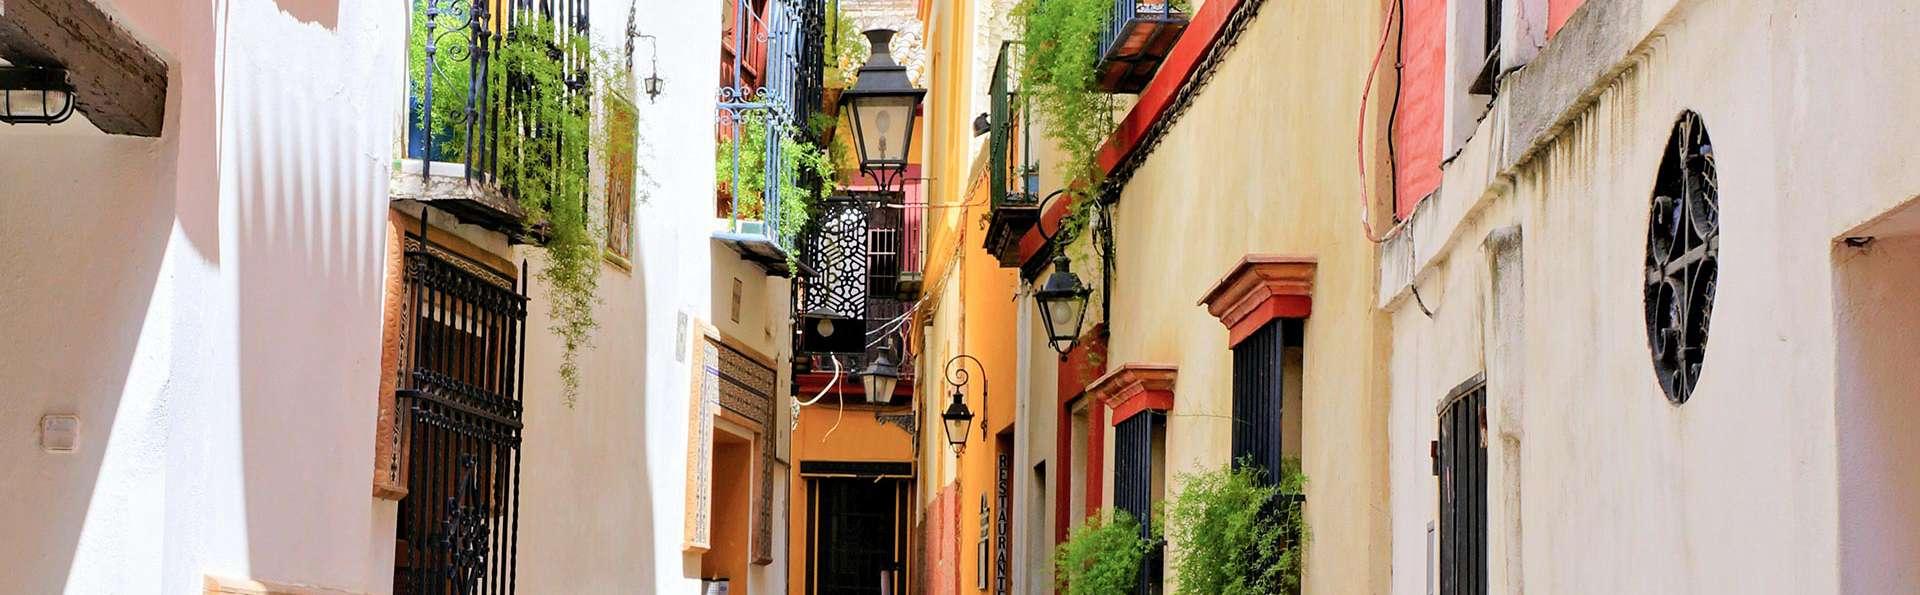 Macià Sevilla Kubb - EDIT_DESTINATION_02.jpg